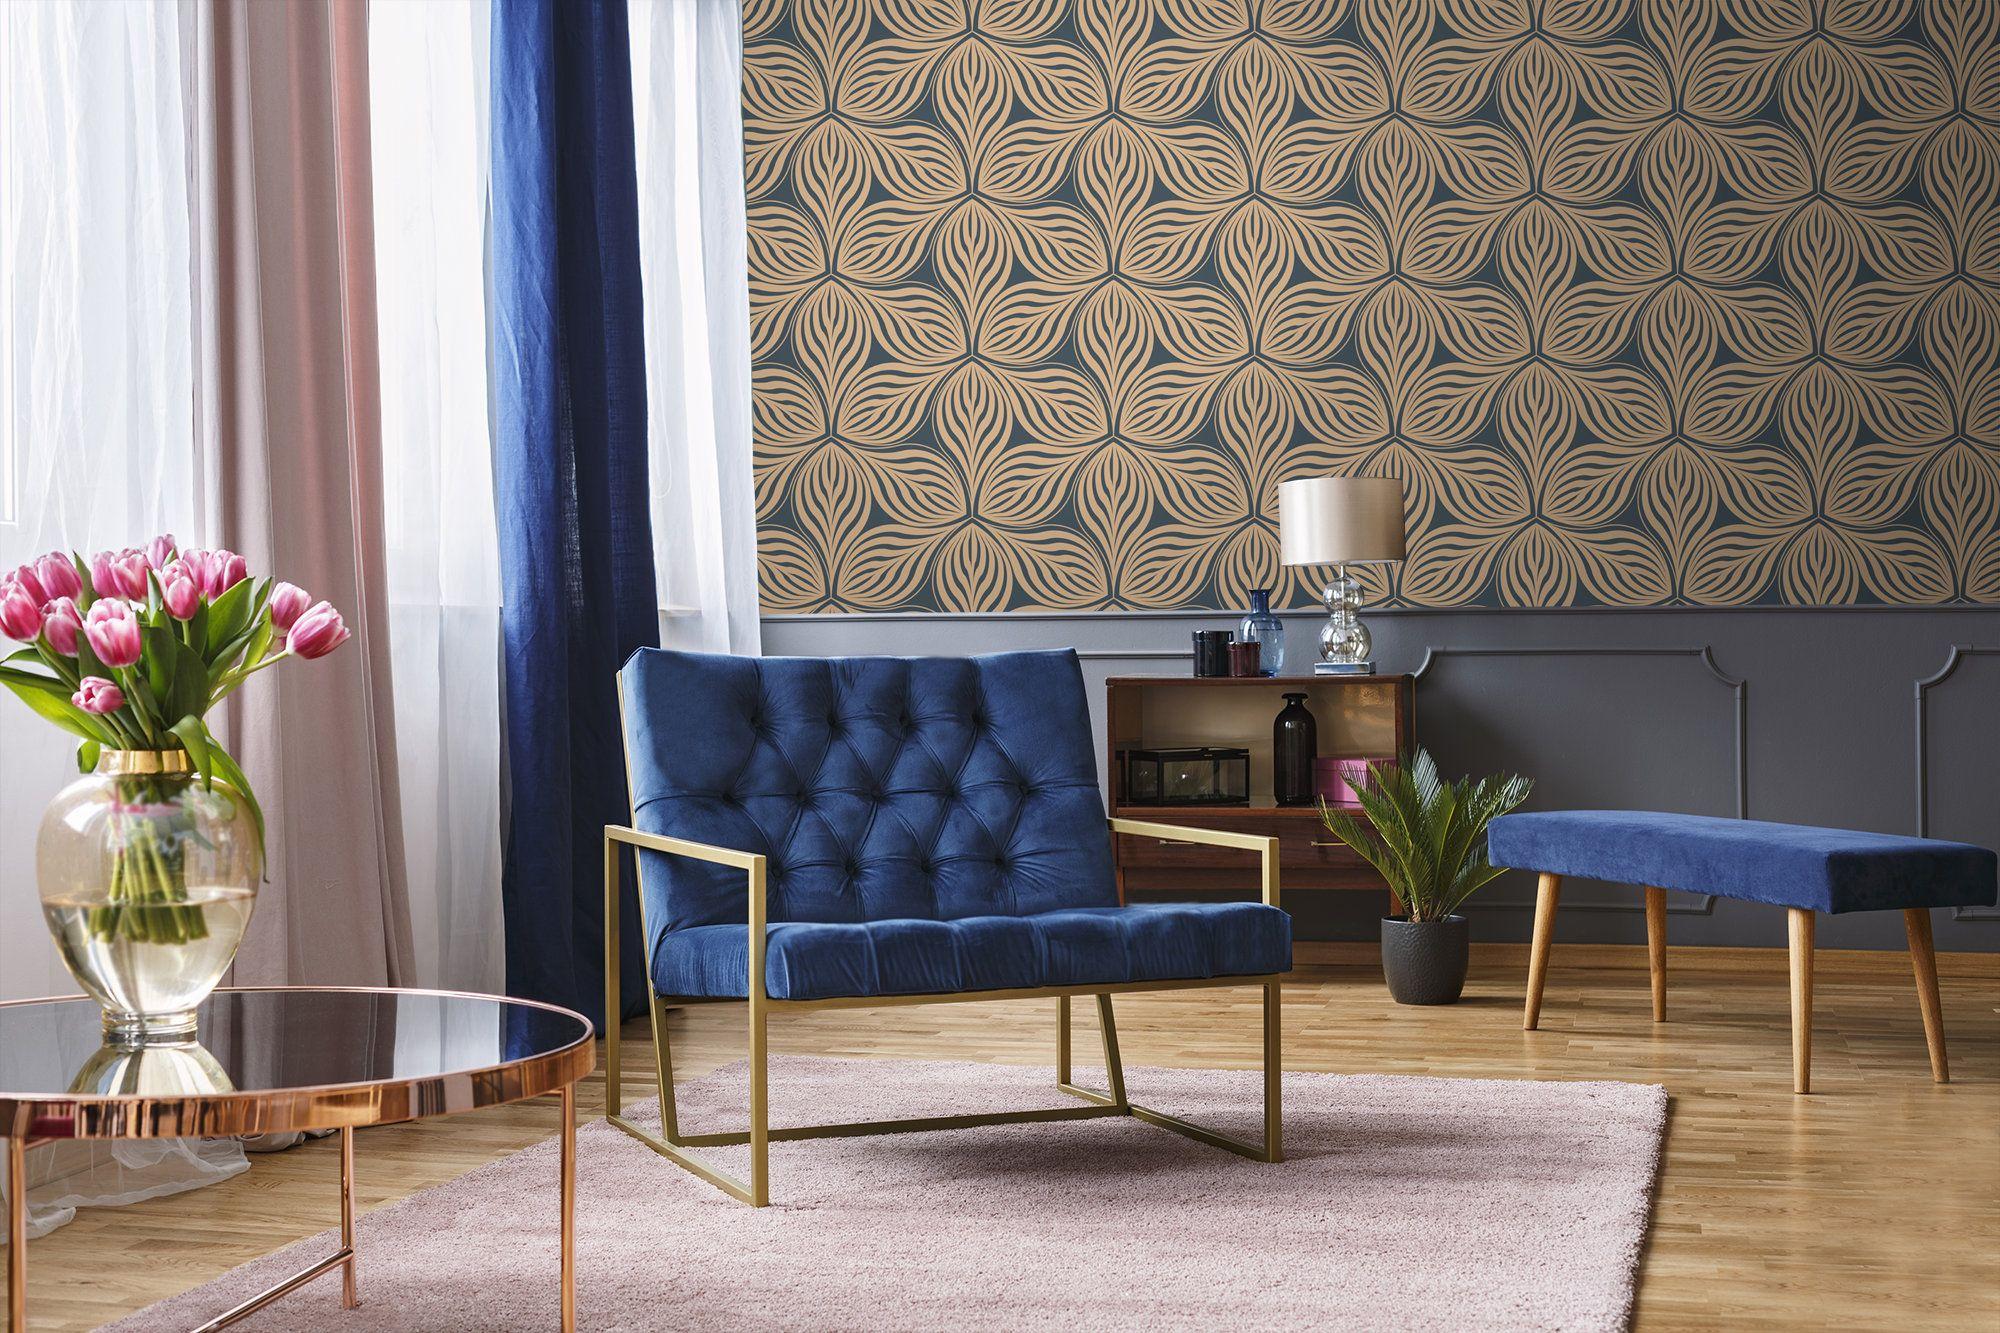 Abstract leaves wallpaper, self adhesive wallpaper